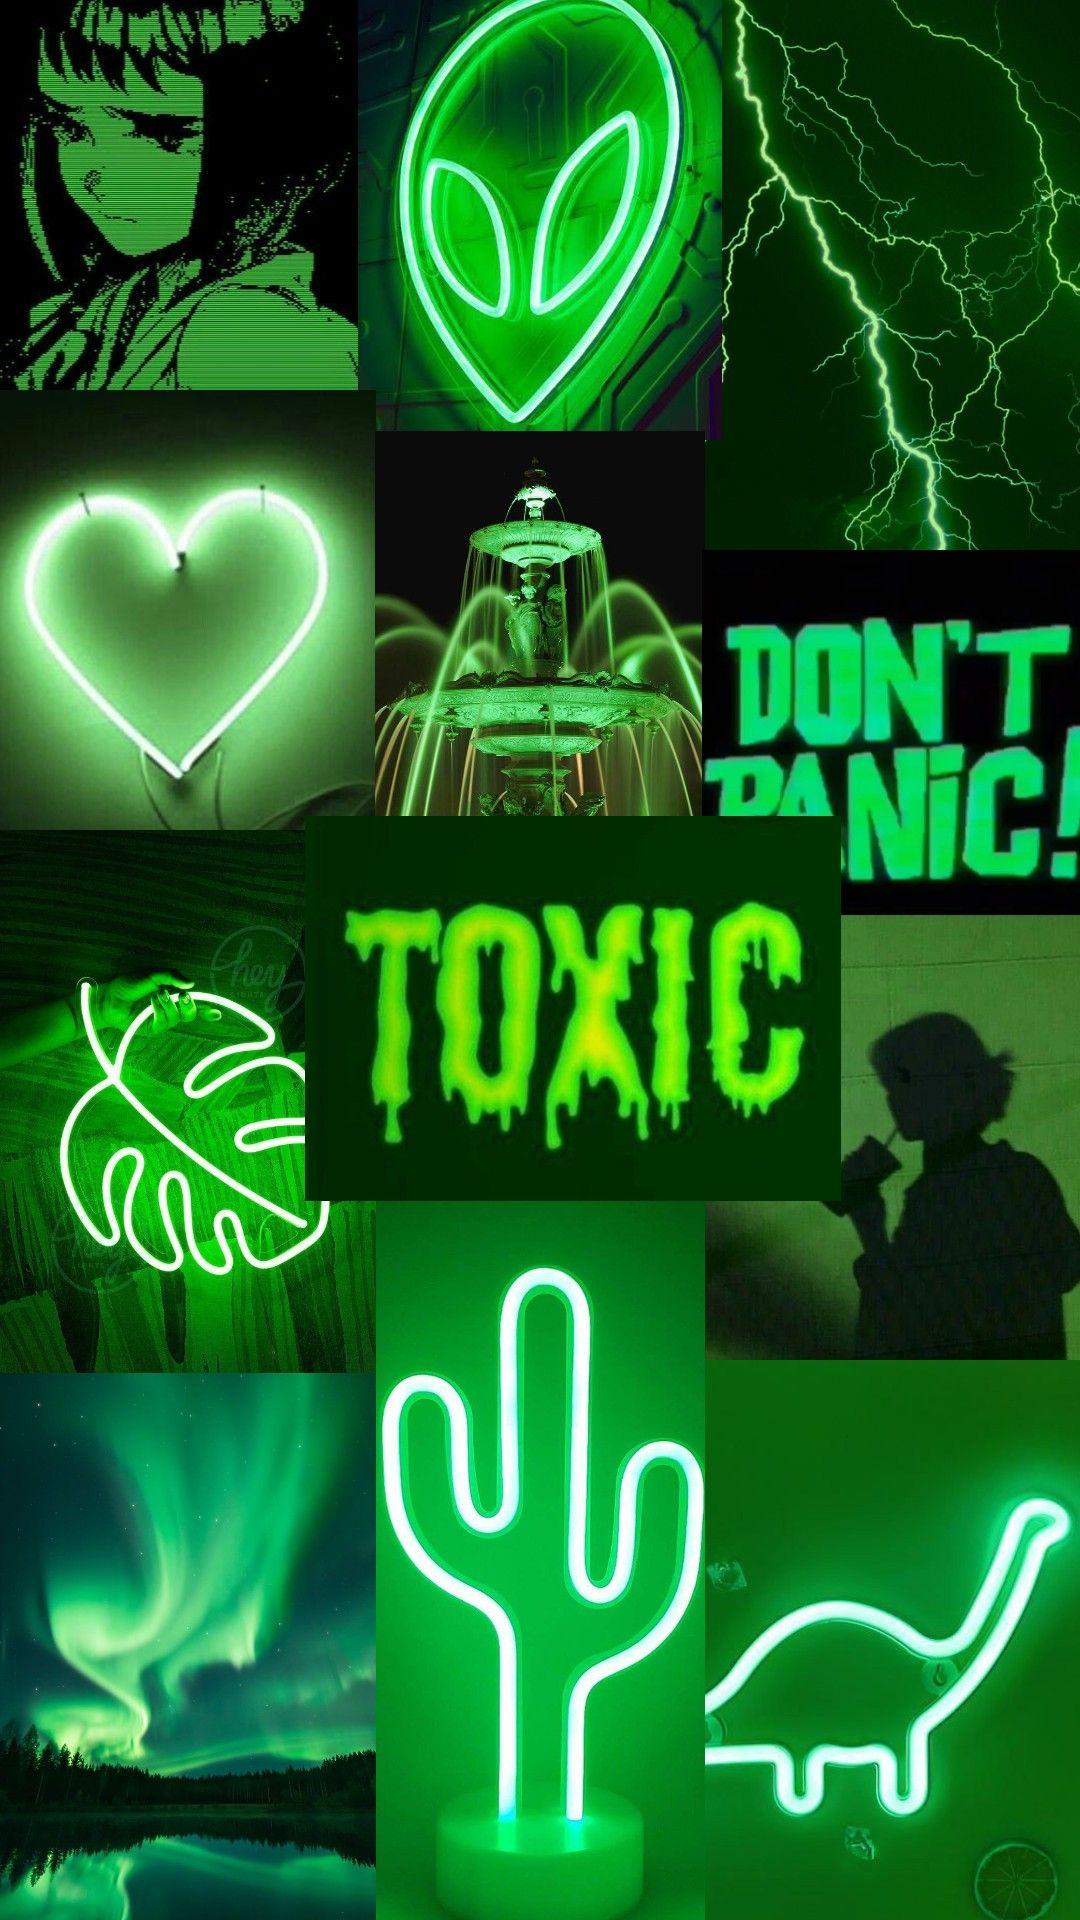 Aesthetic Neon Green Wallpaper College Pretty Wallpaper Iphone Pretty Wallpapers Green Aesthetic